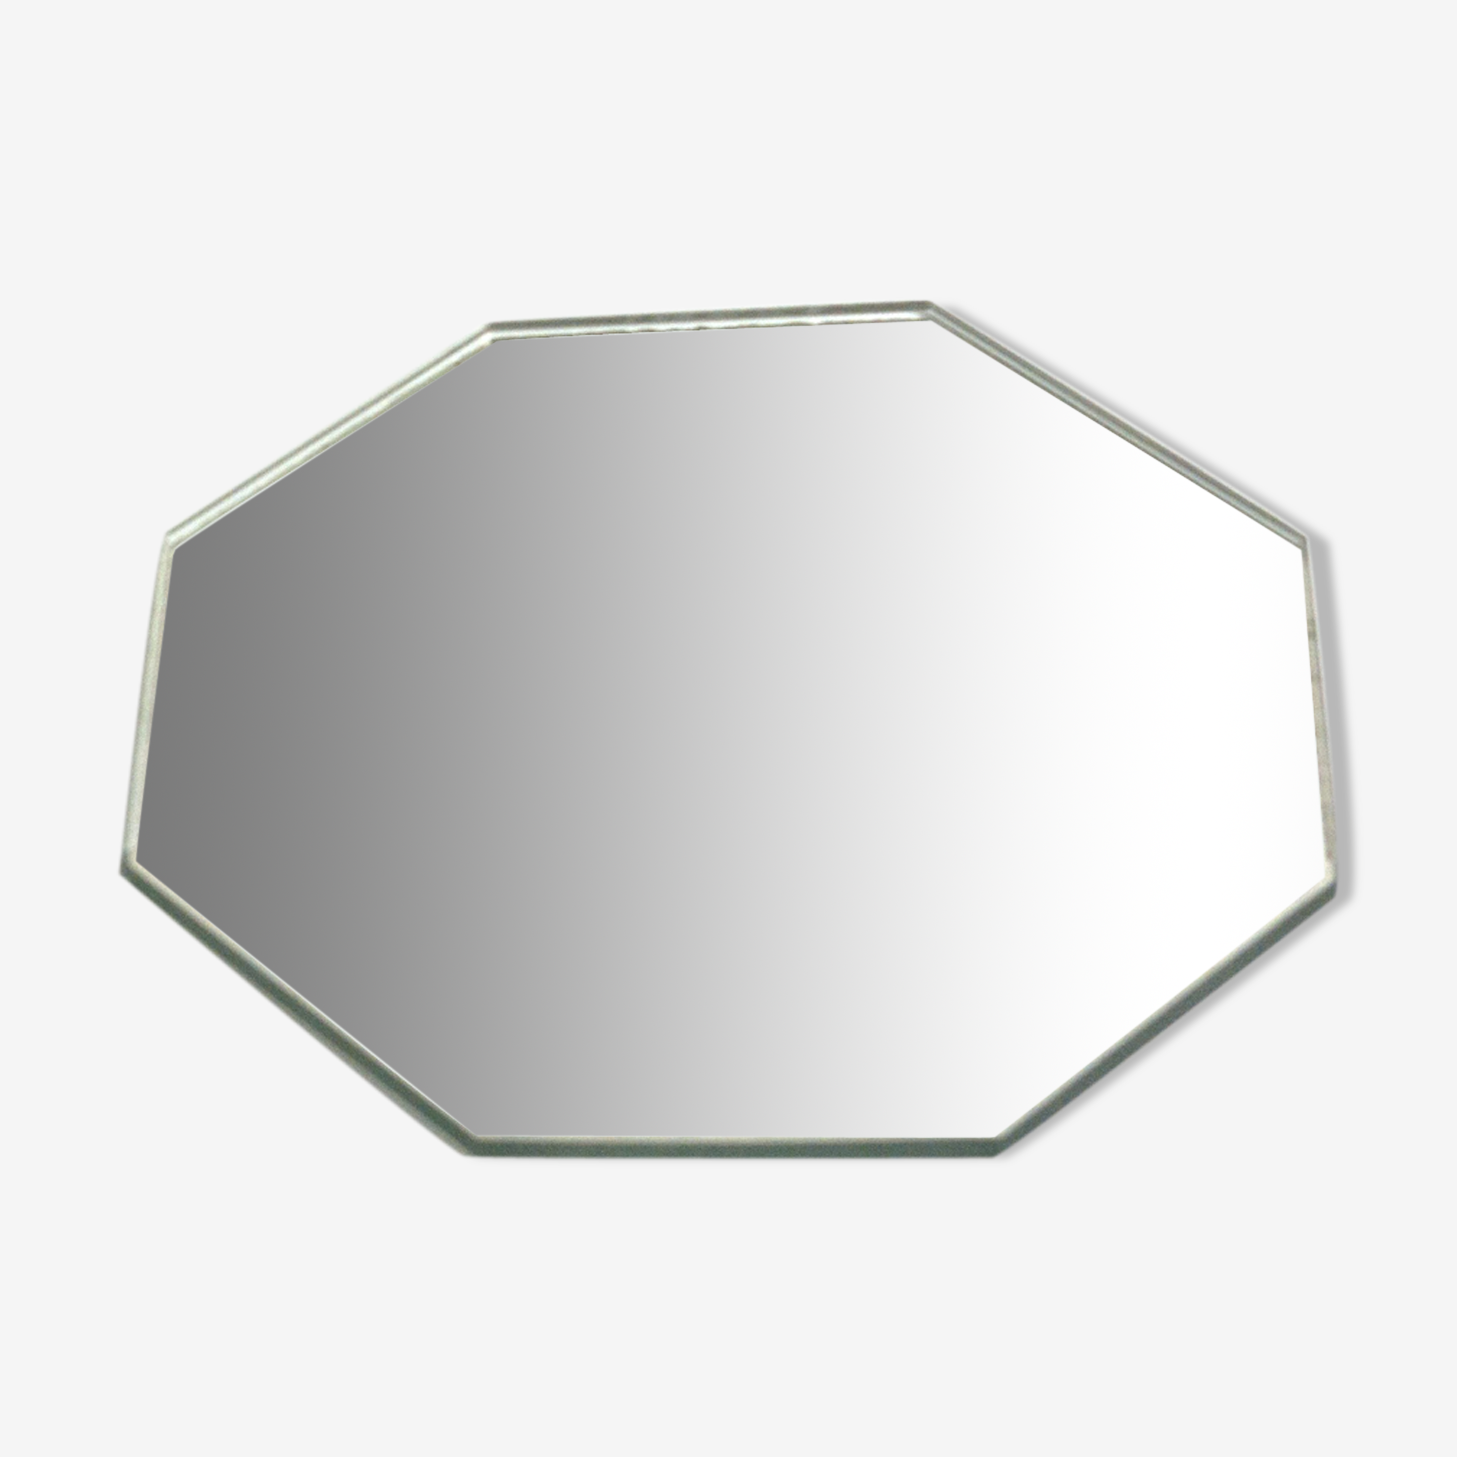 Octagonal vintage mirror 16x16